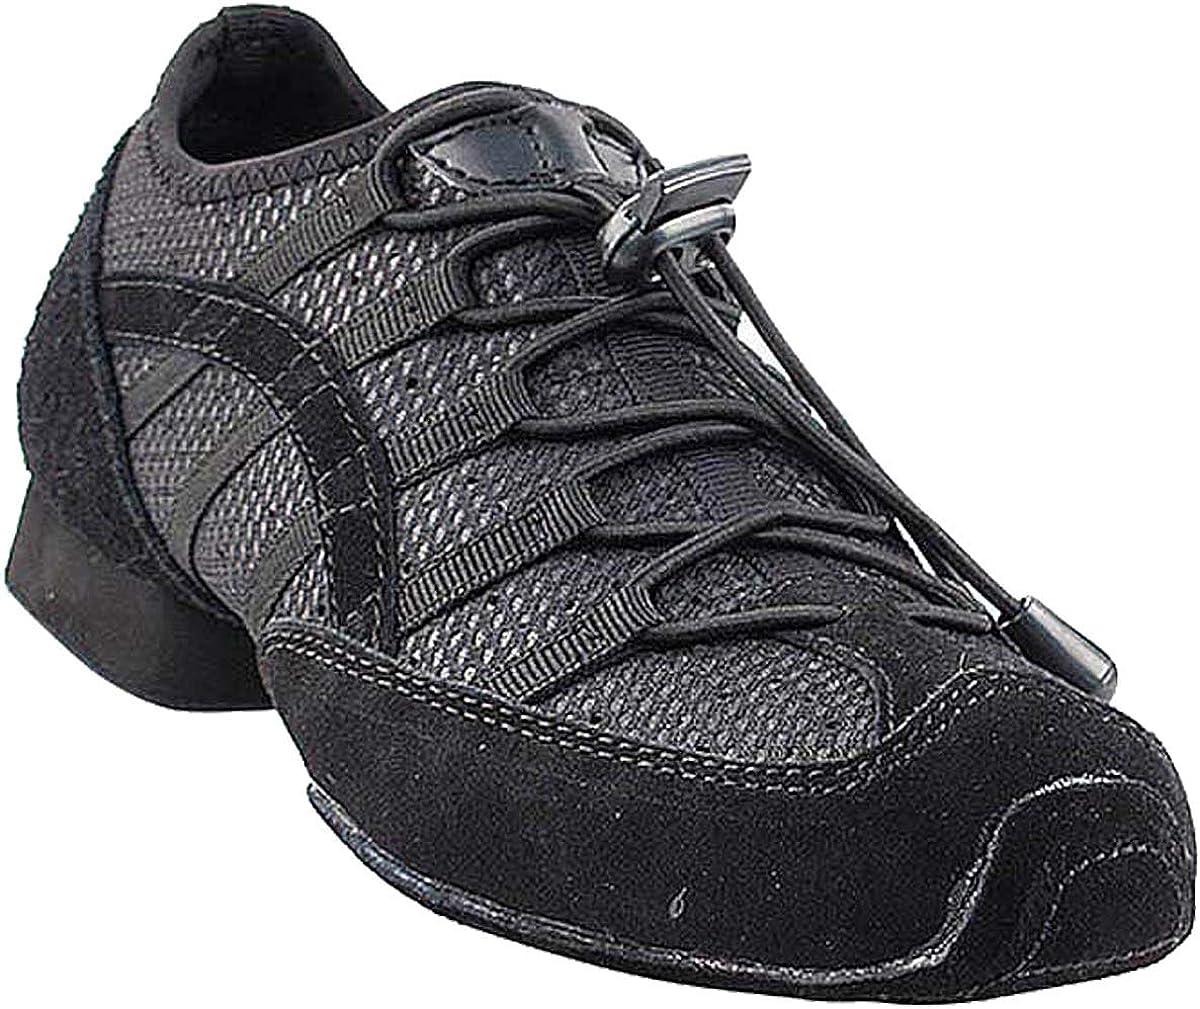 Men's Women's Practice Dance Sneaker Shoes Split Sole VFSN005EB Comfortable -Very Fine {Bundle of 5}